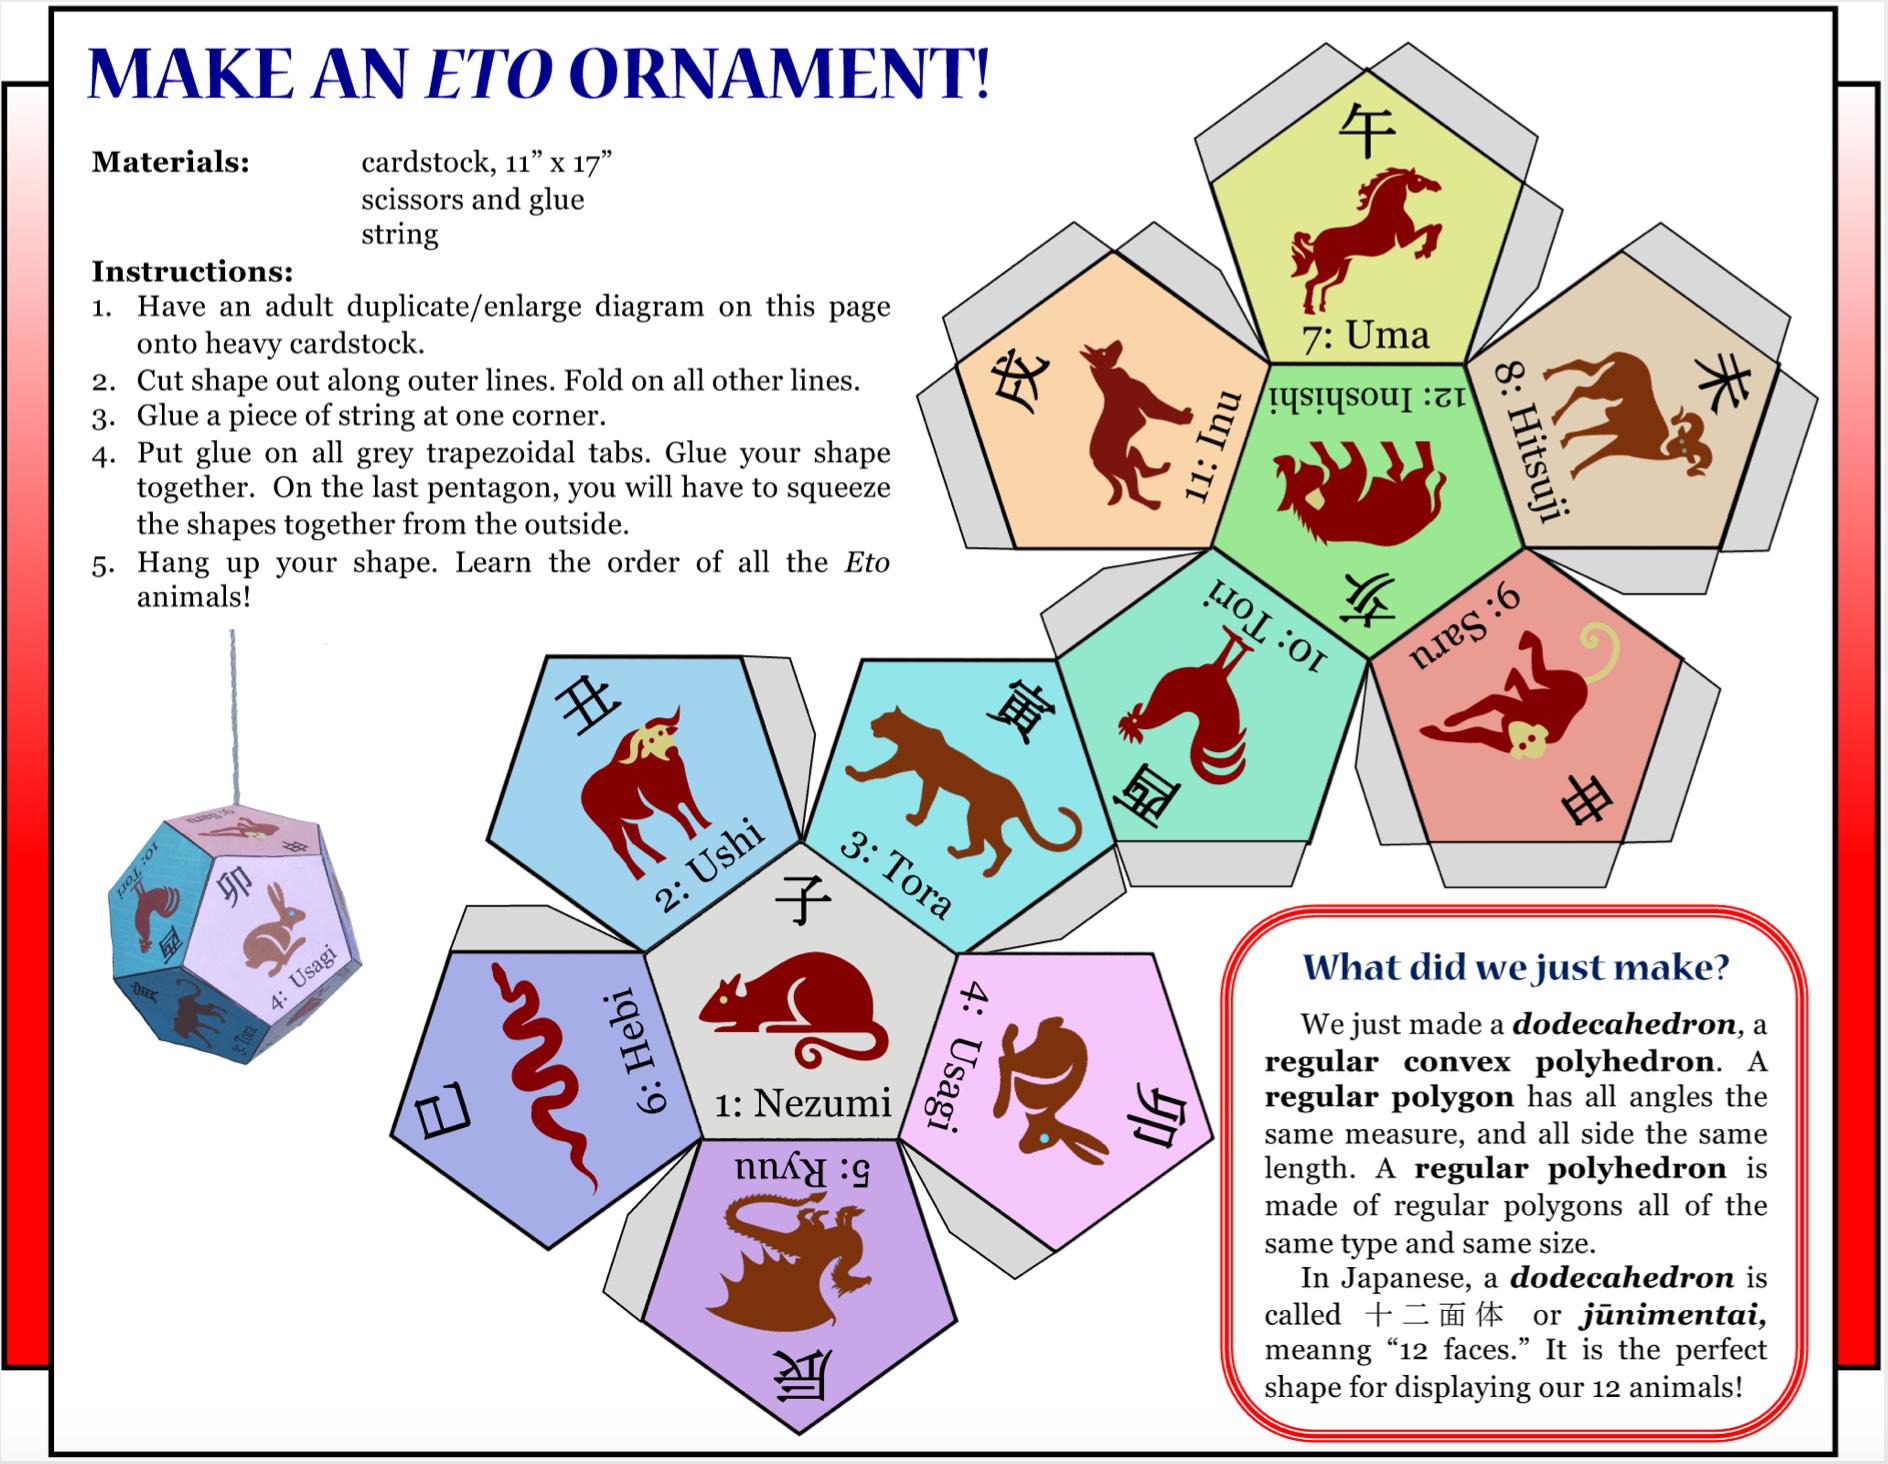 Culture4Kids! 'Make an Eto Ornament!'